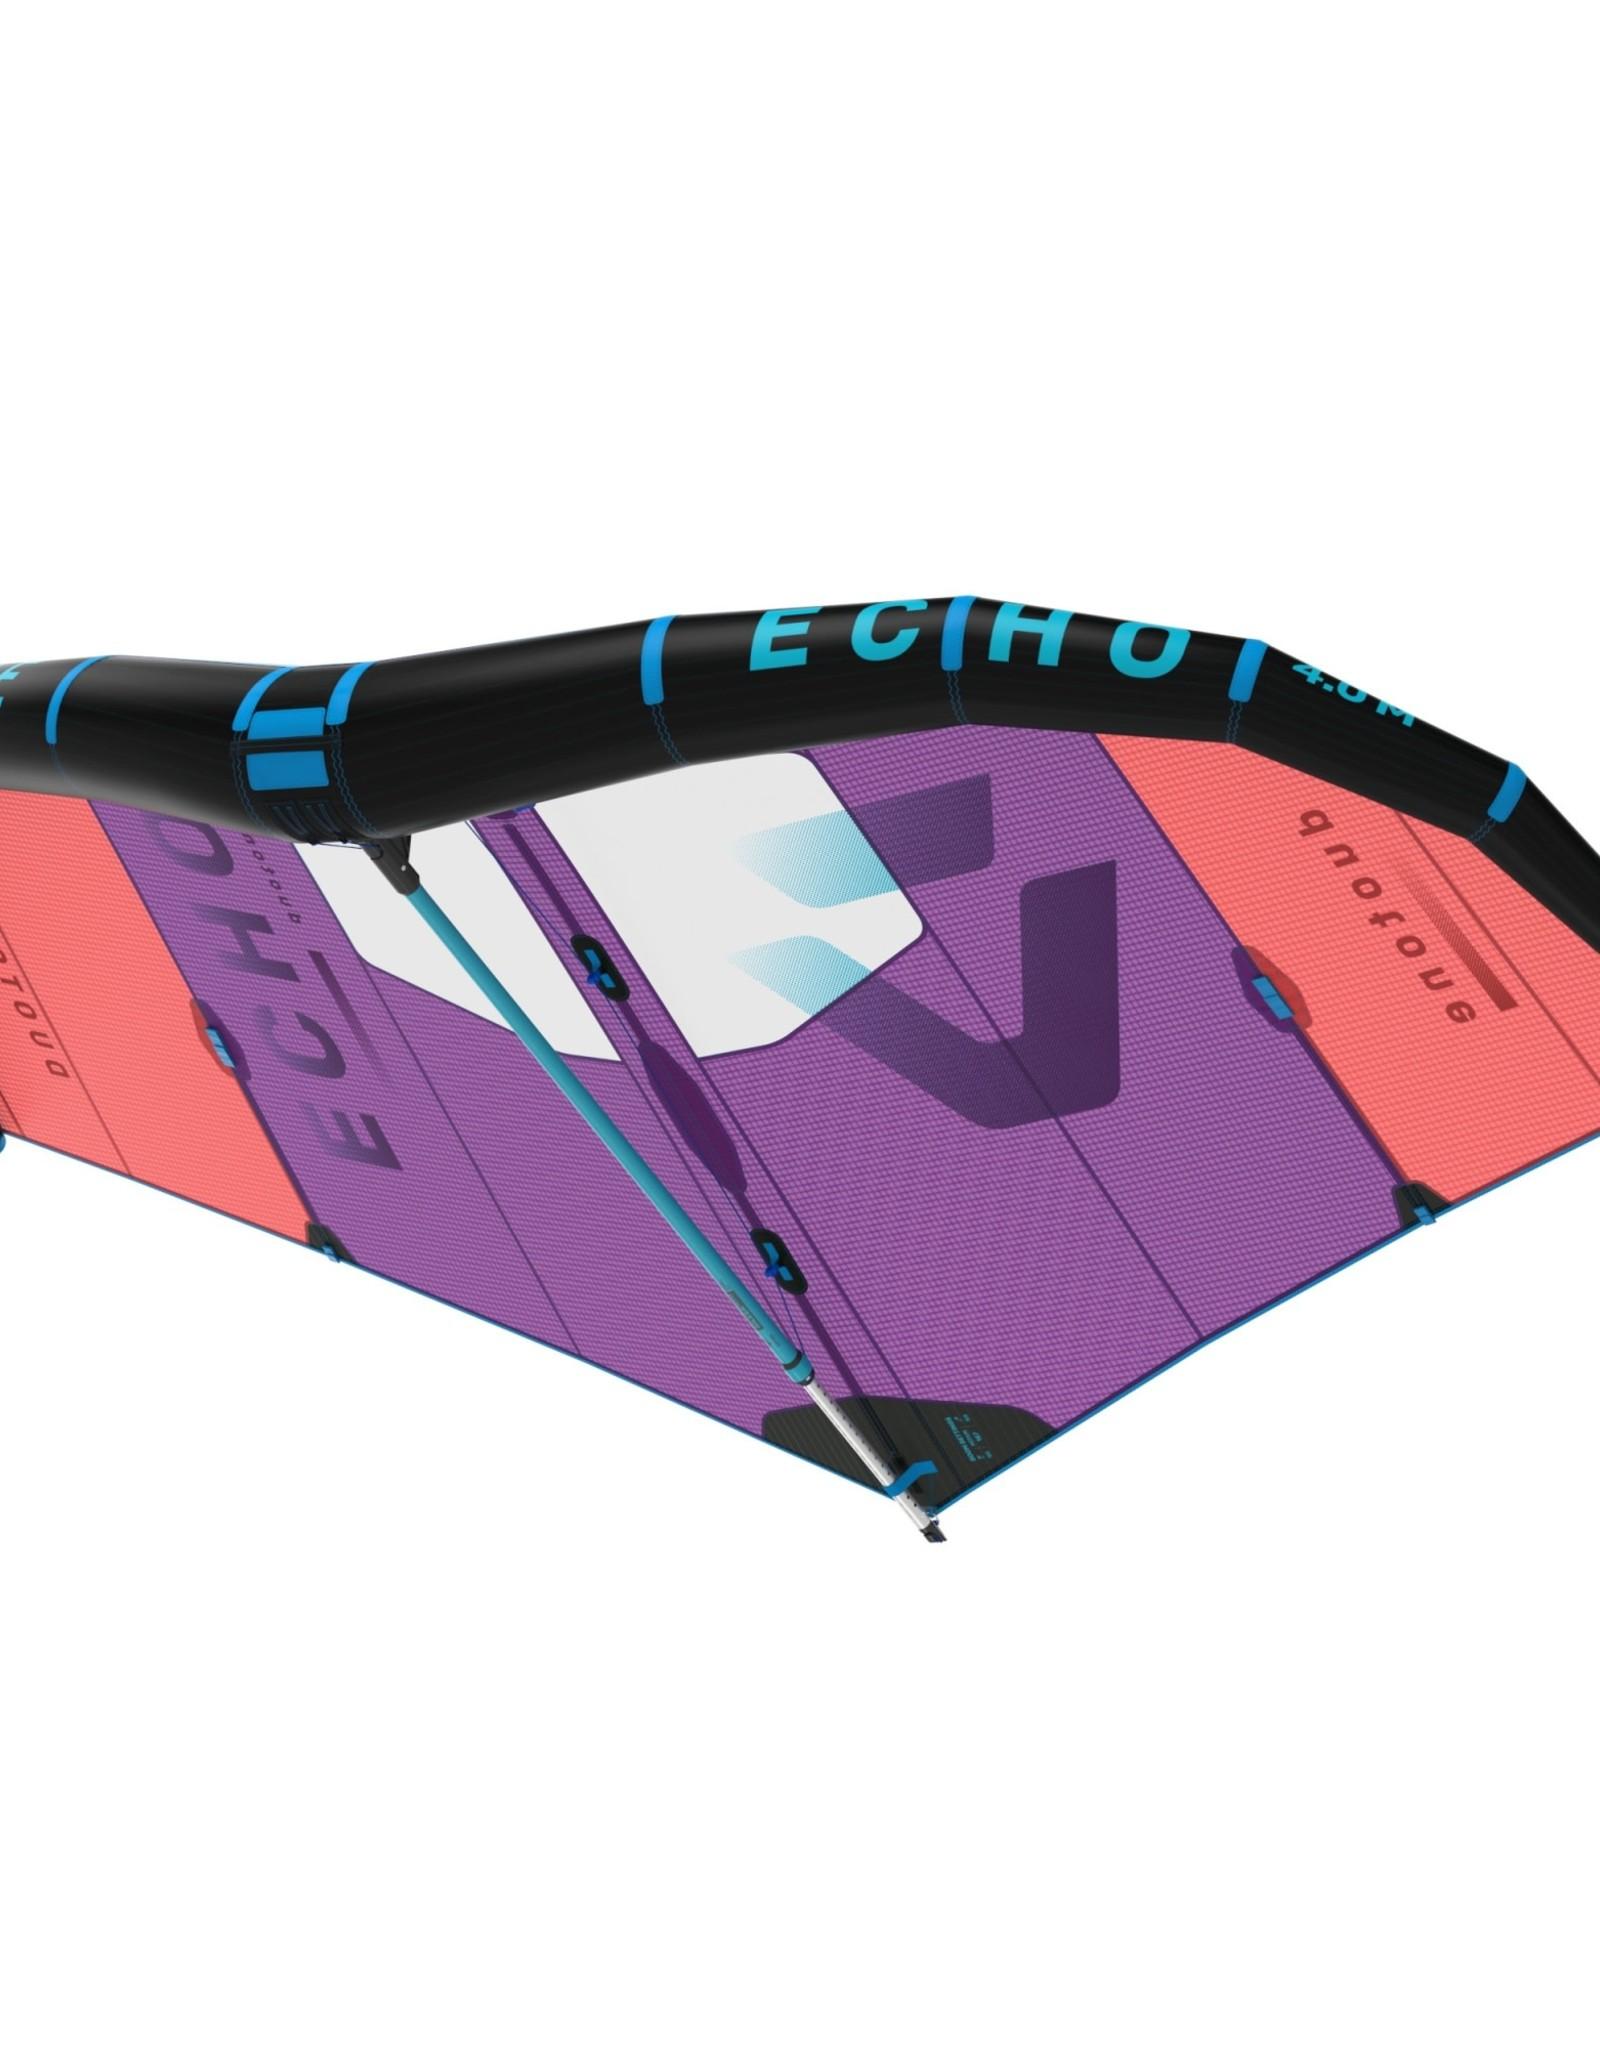 Duotone Duotone ECHO 5m red/purple